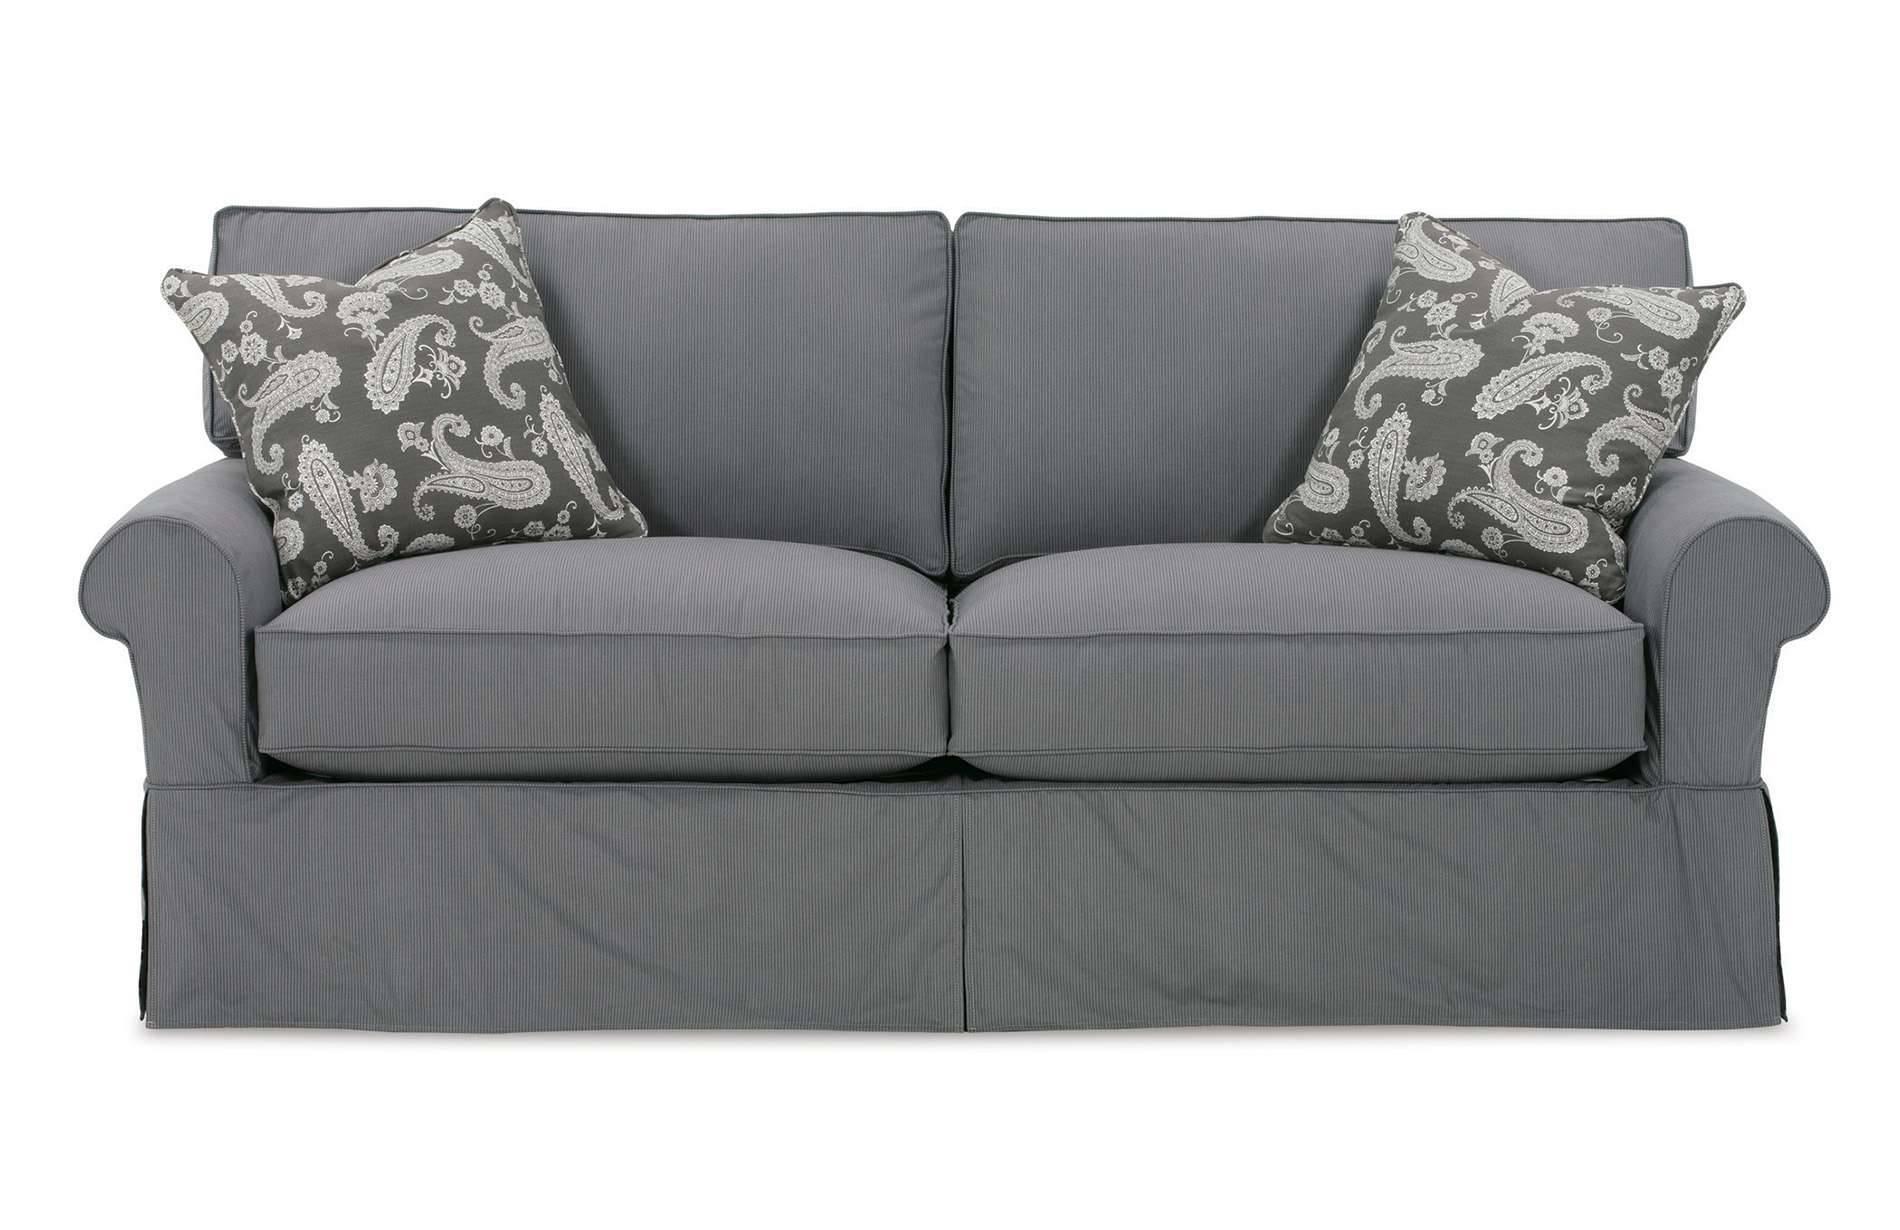 Queen Size Sleeper Sofa Cover | Centerfieldbar inside Sleeper Sofa Slipcovers (Image 9 of 15)